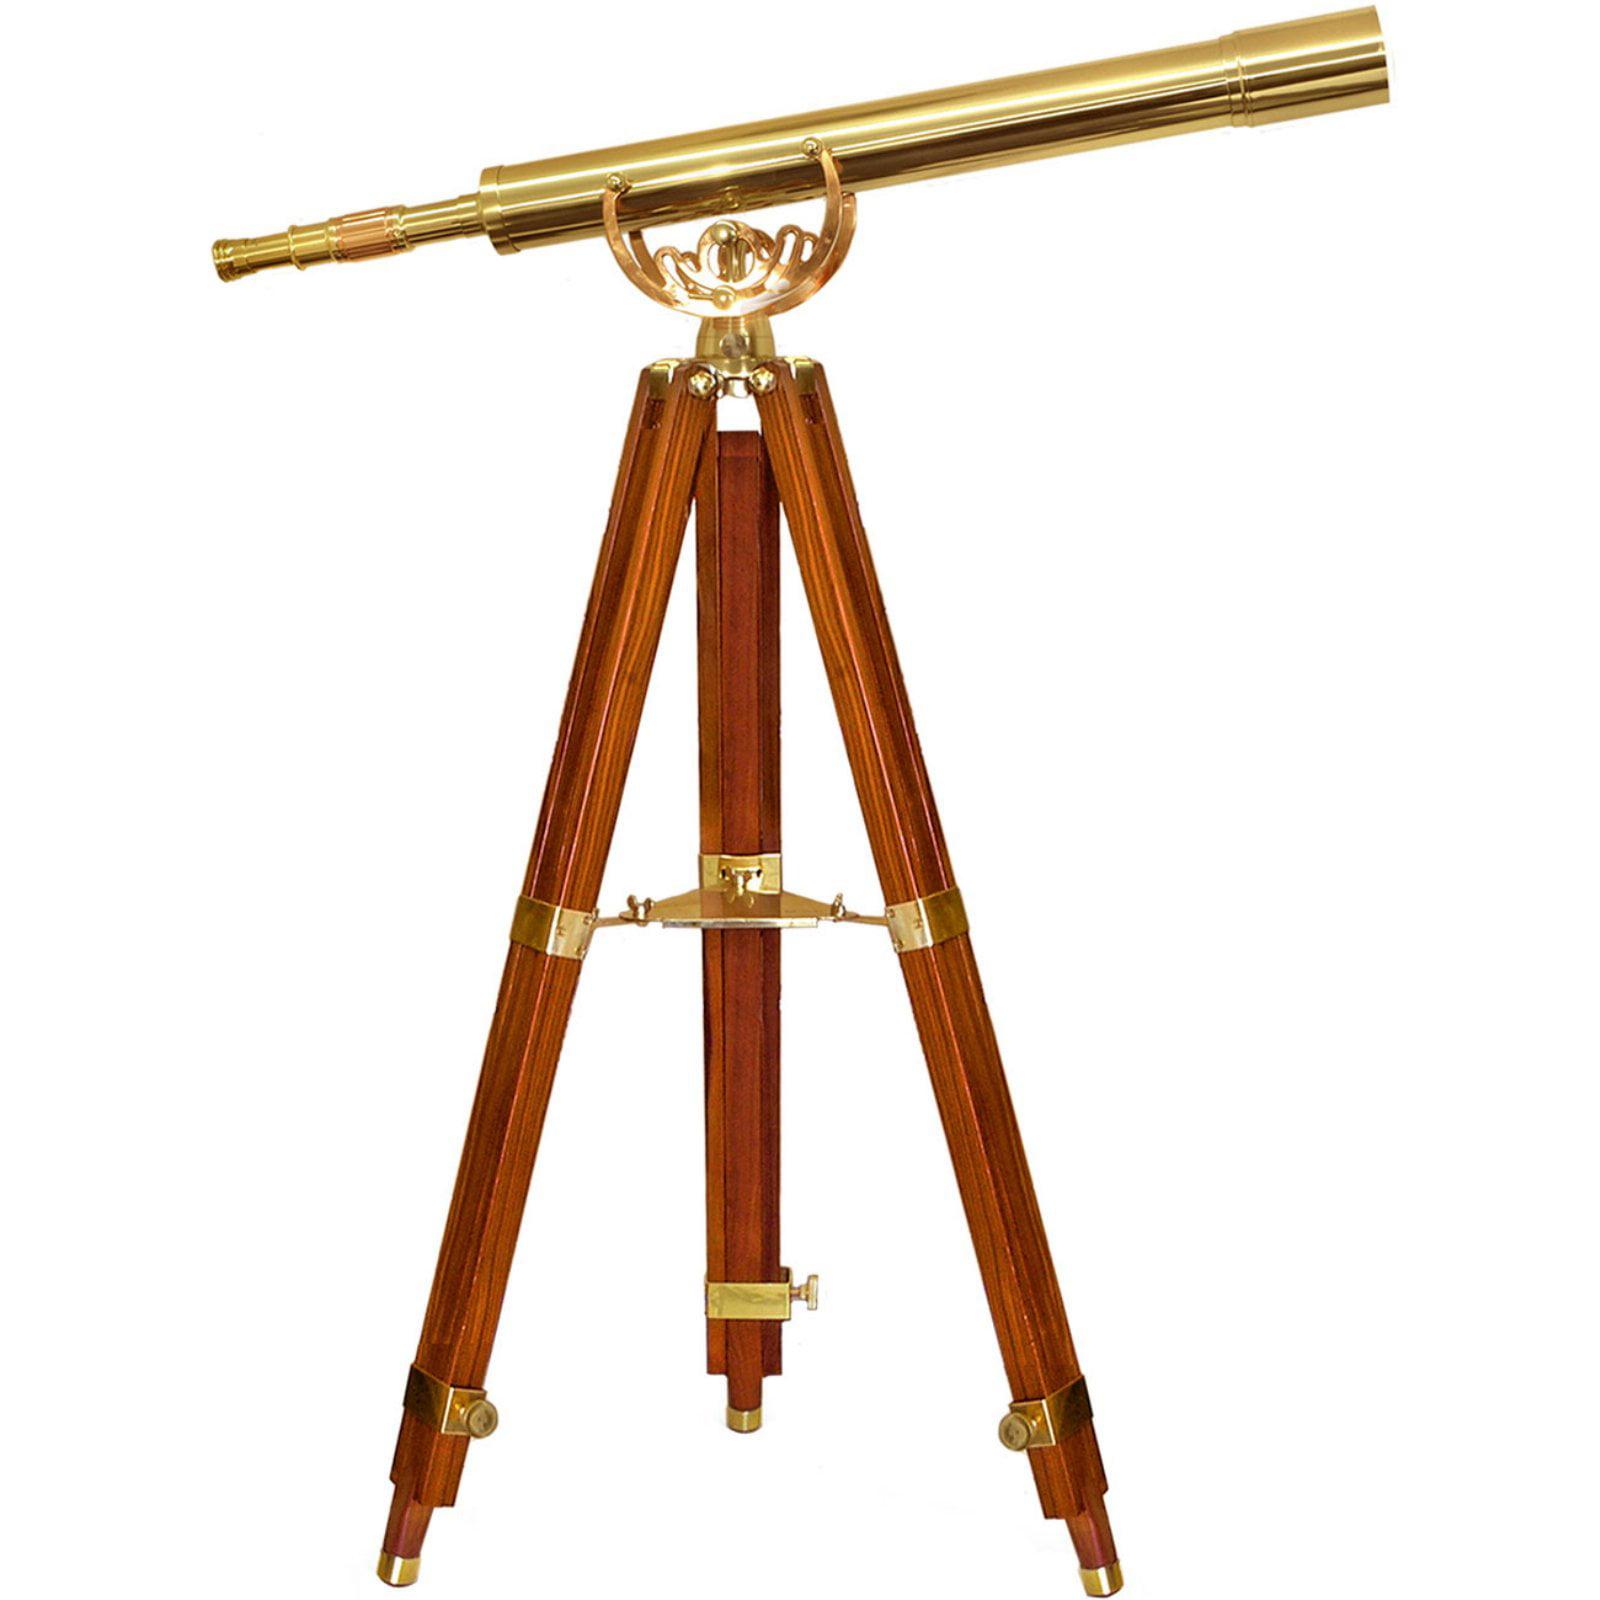 Barska 32x80 Anchormaster Brass Telescope by Barska